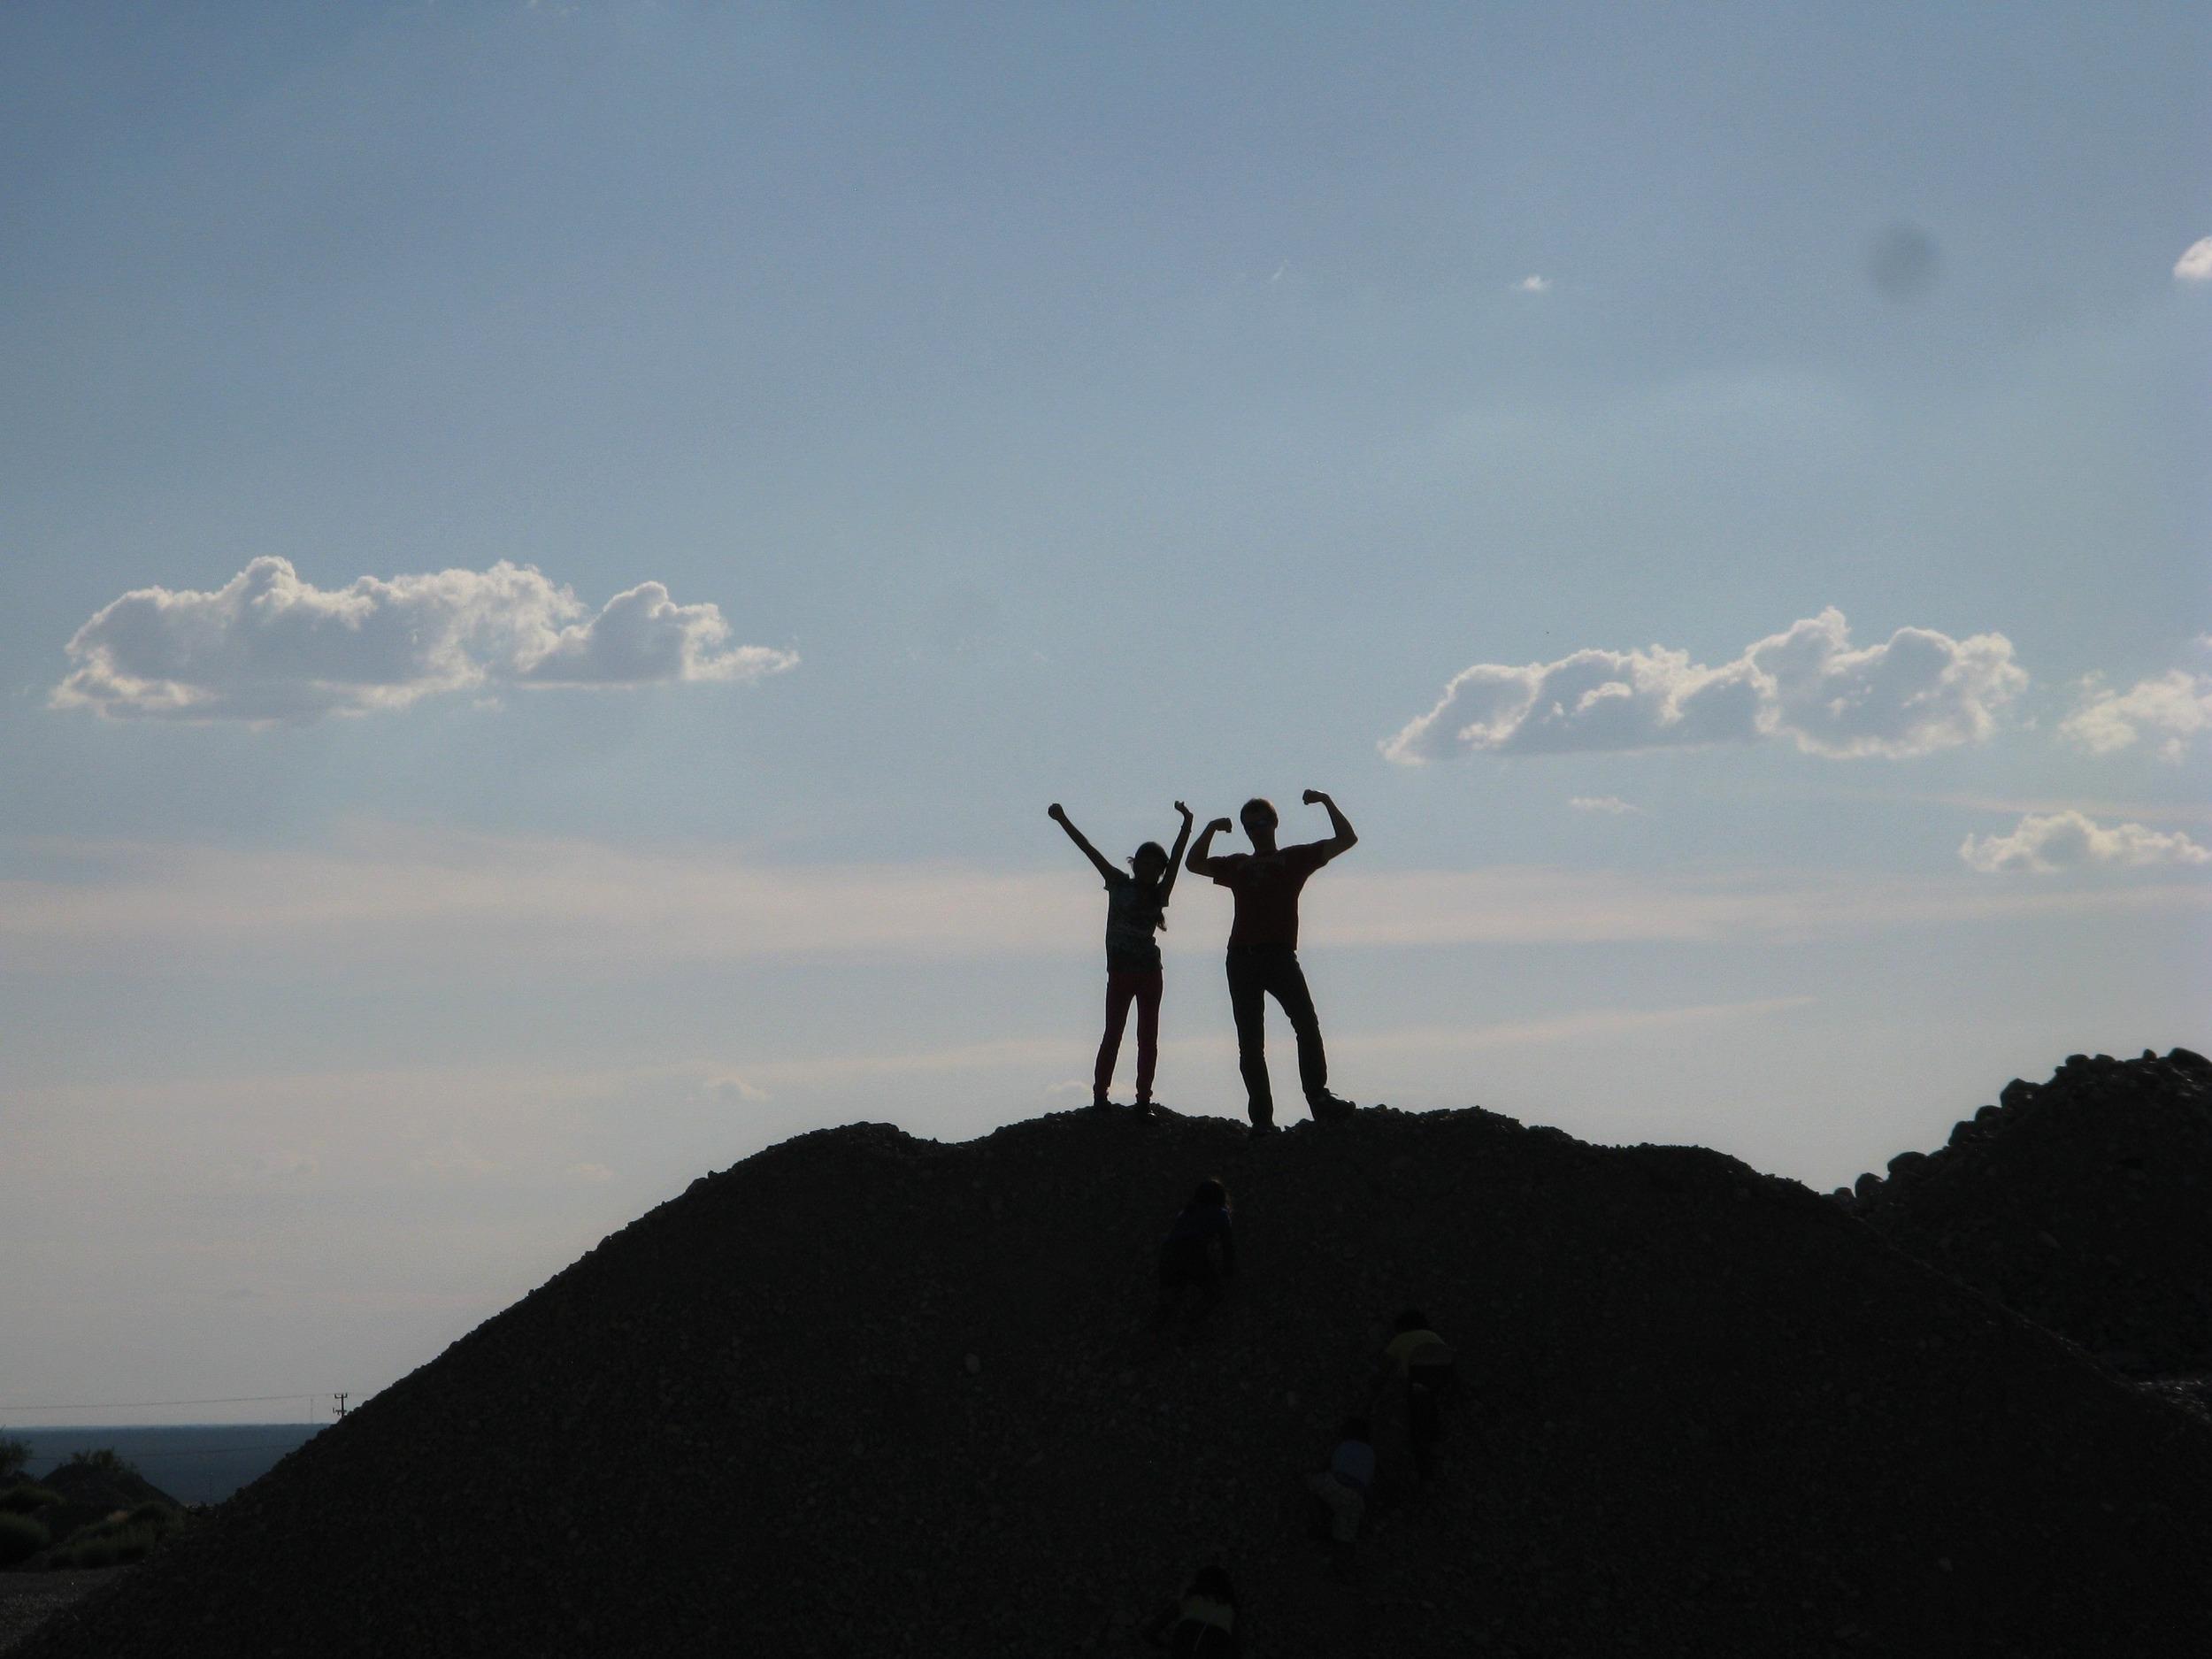 Summer summit silhouettes.